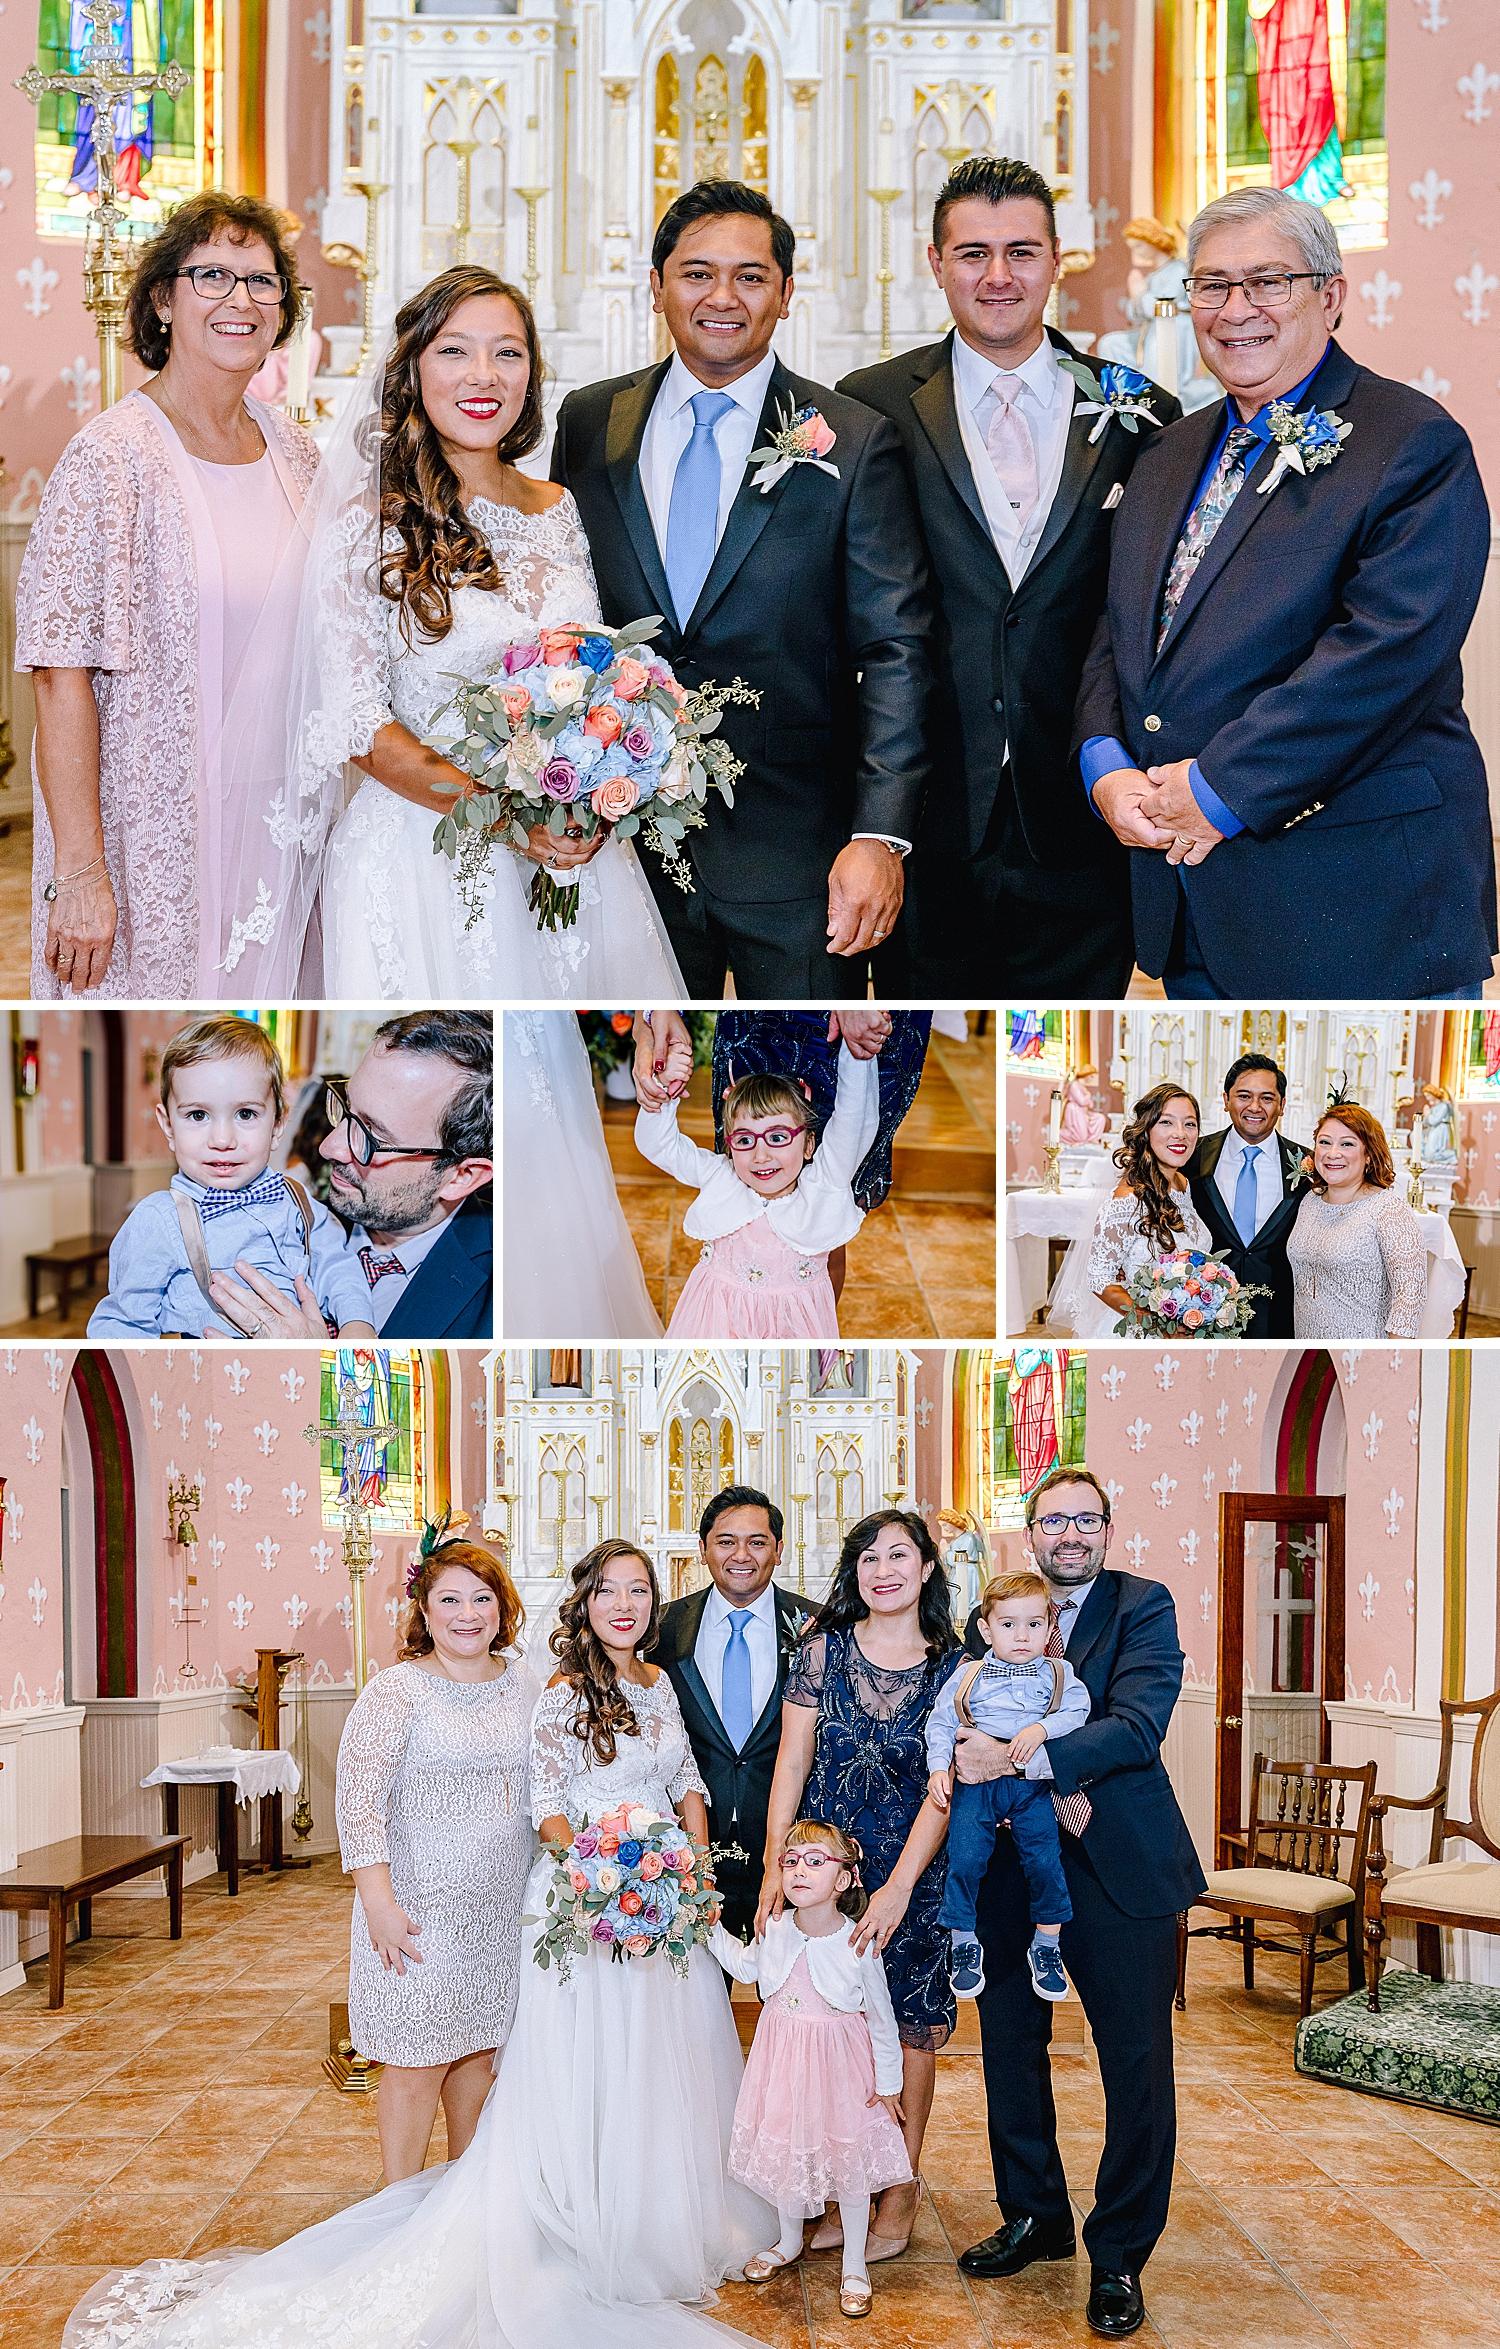 Bandera-Texas-Wedding-Photographer-Bride-Groom-on-Horses-Carly-Barton-Photography_0048.jpg